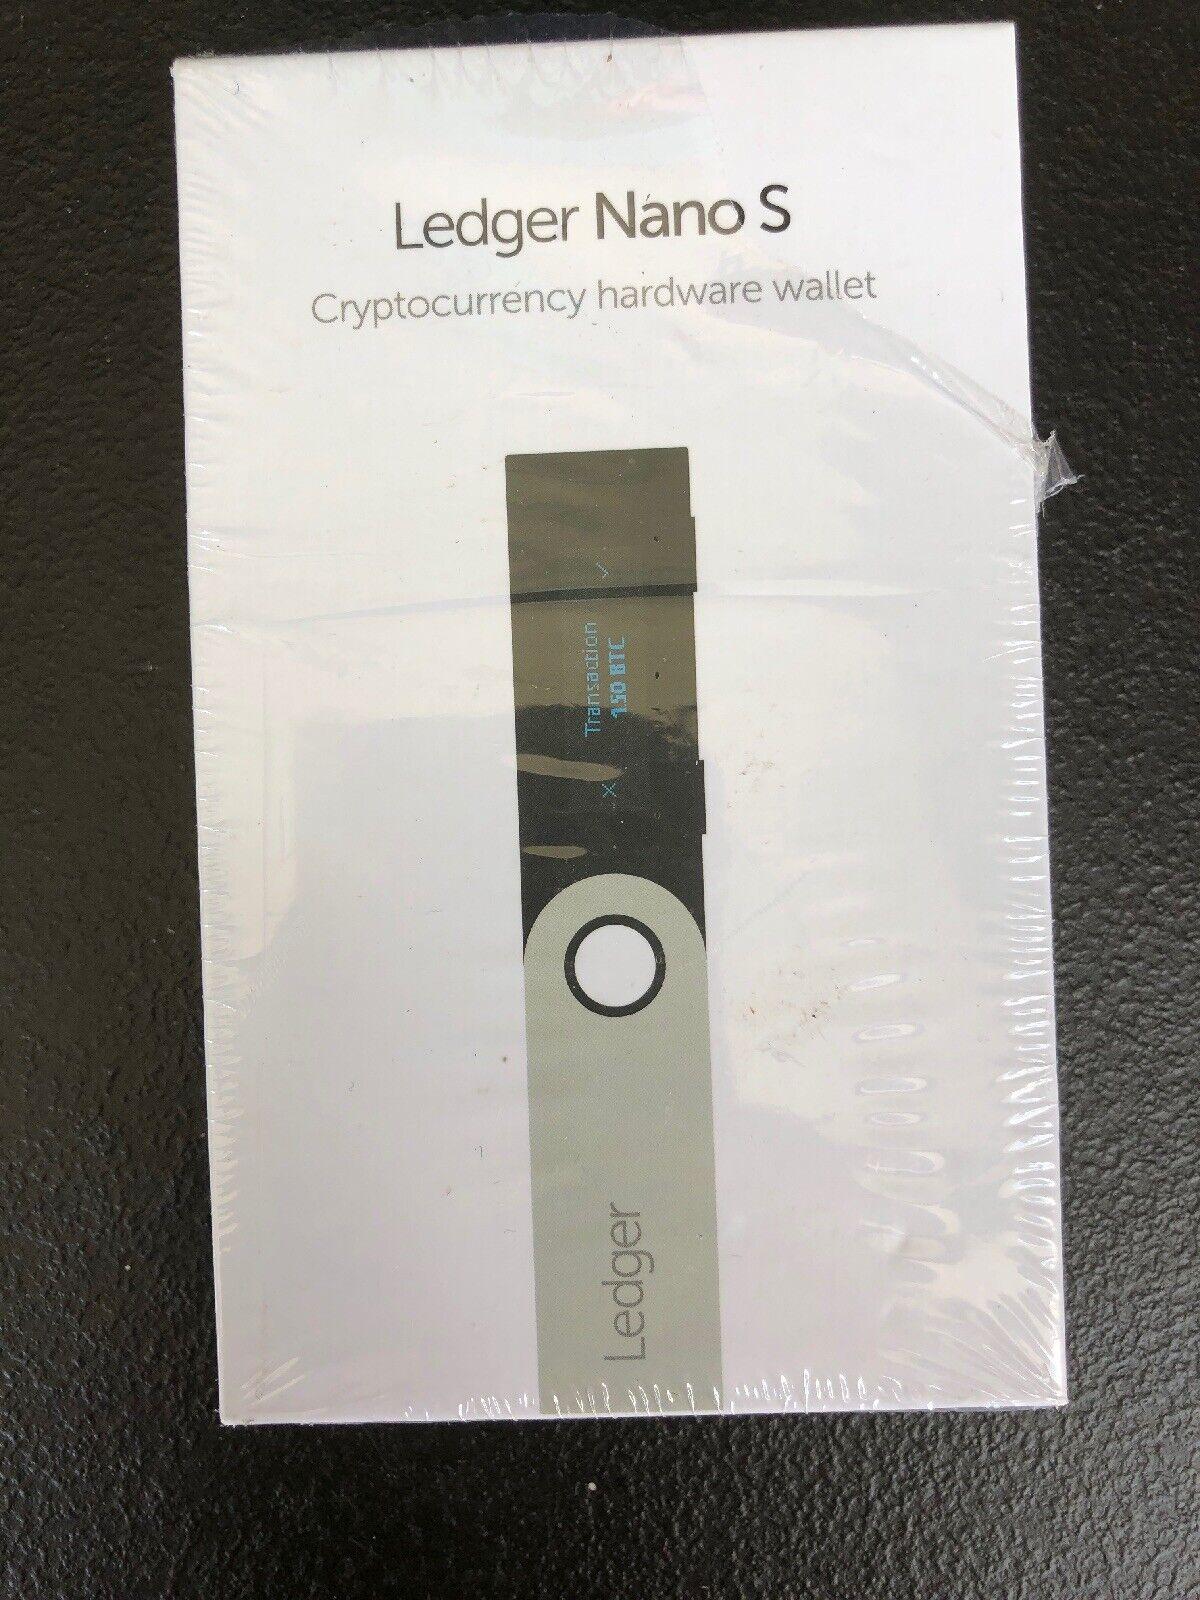 Ledger Nano S Cryptocurrency Encryption Bitcoin Ethereum Hardware Wallet 1